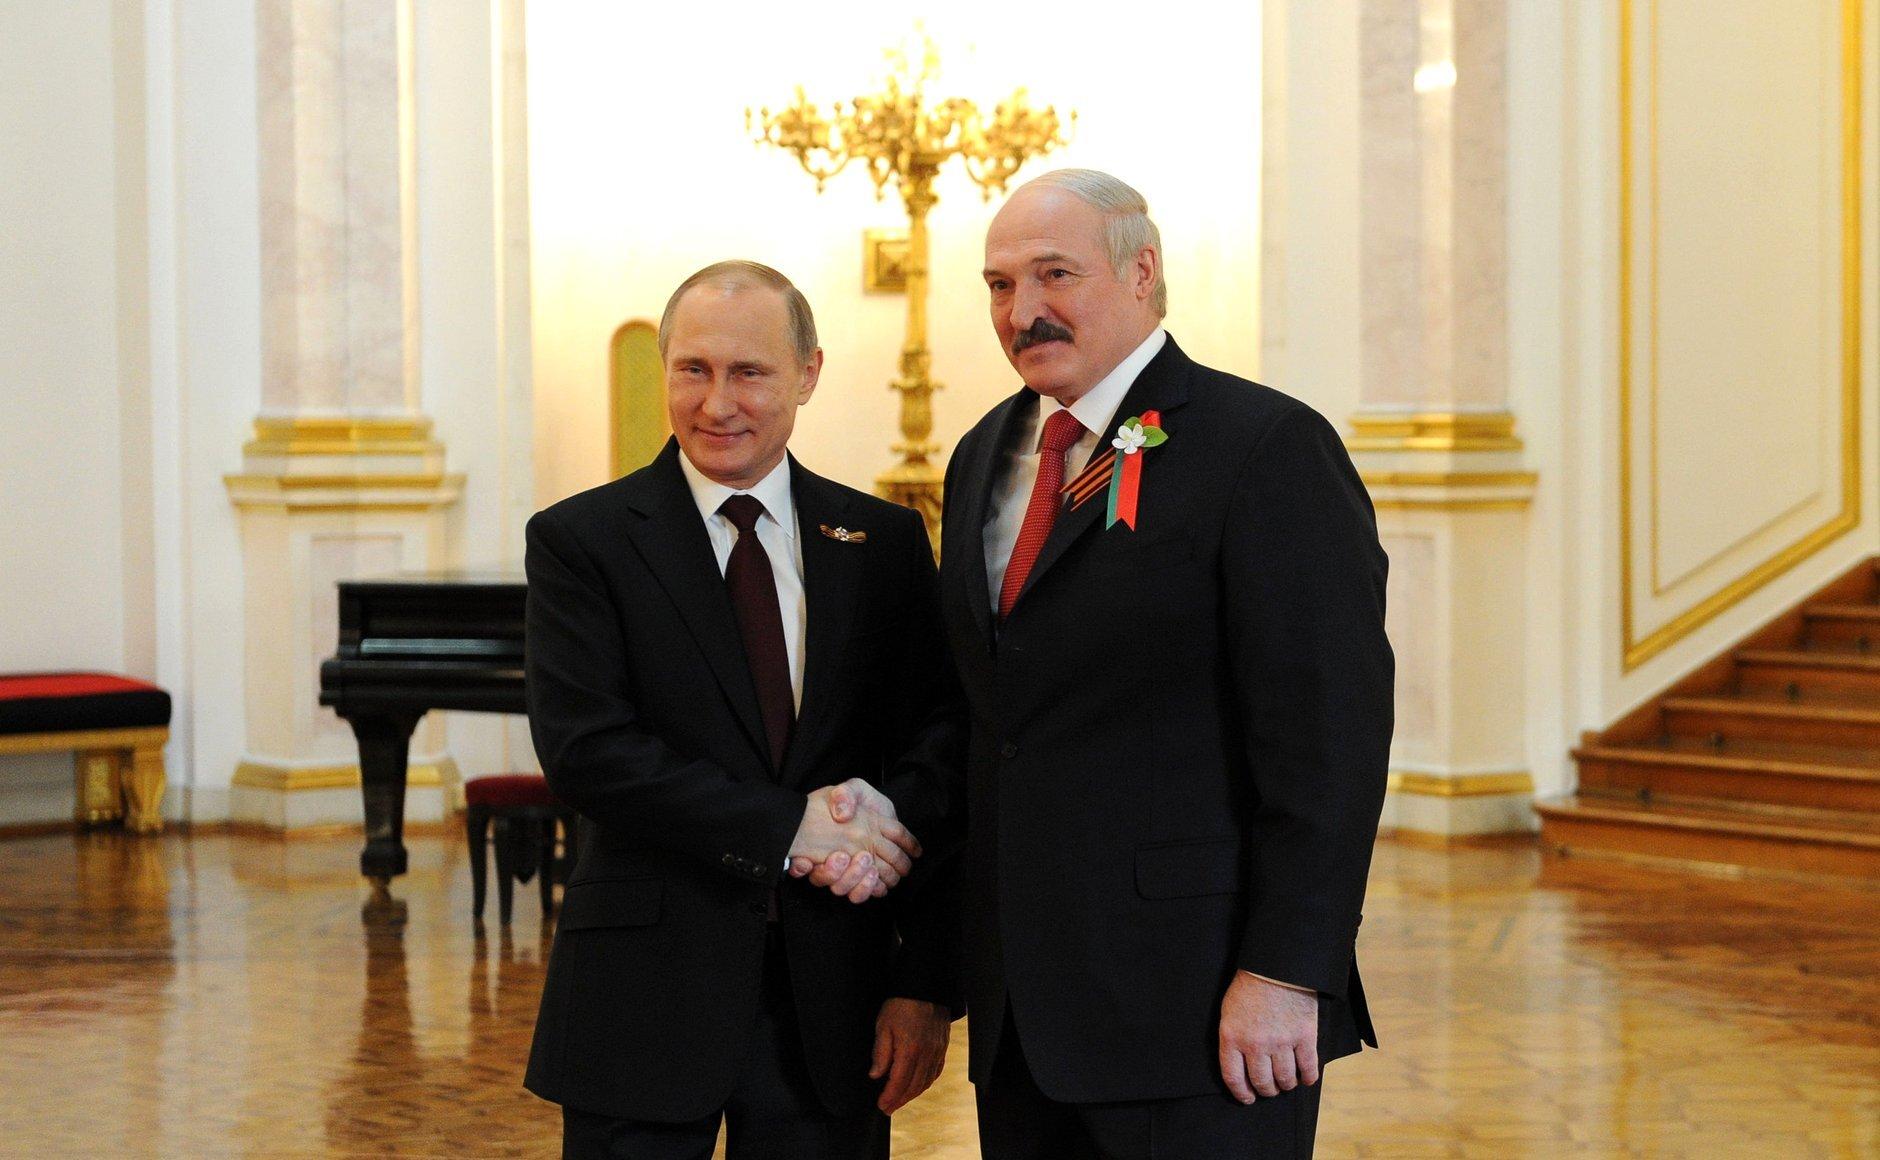 Putin_with_Alexander_Lukashenko_2015.jpg